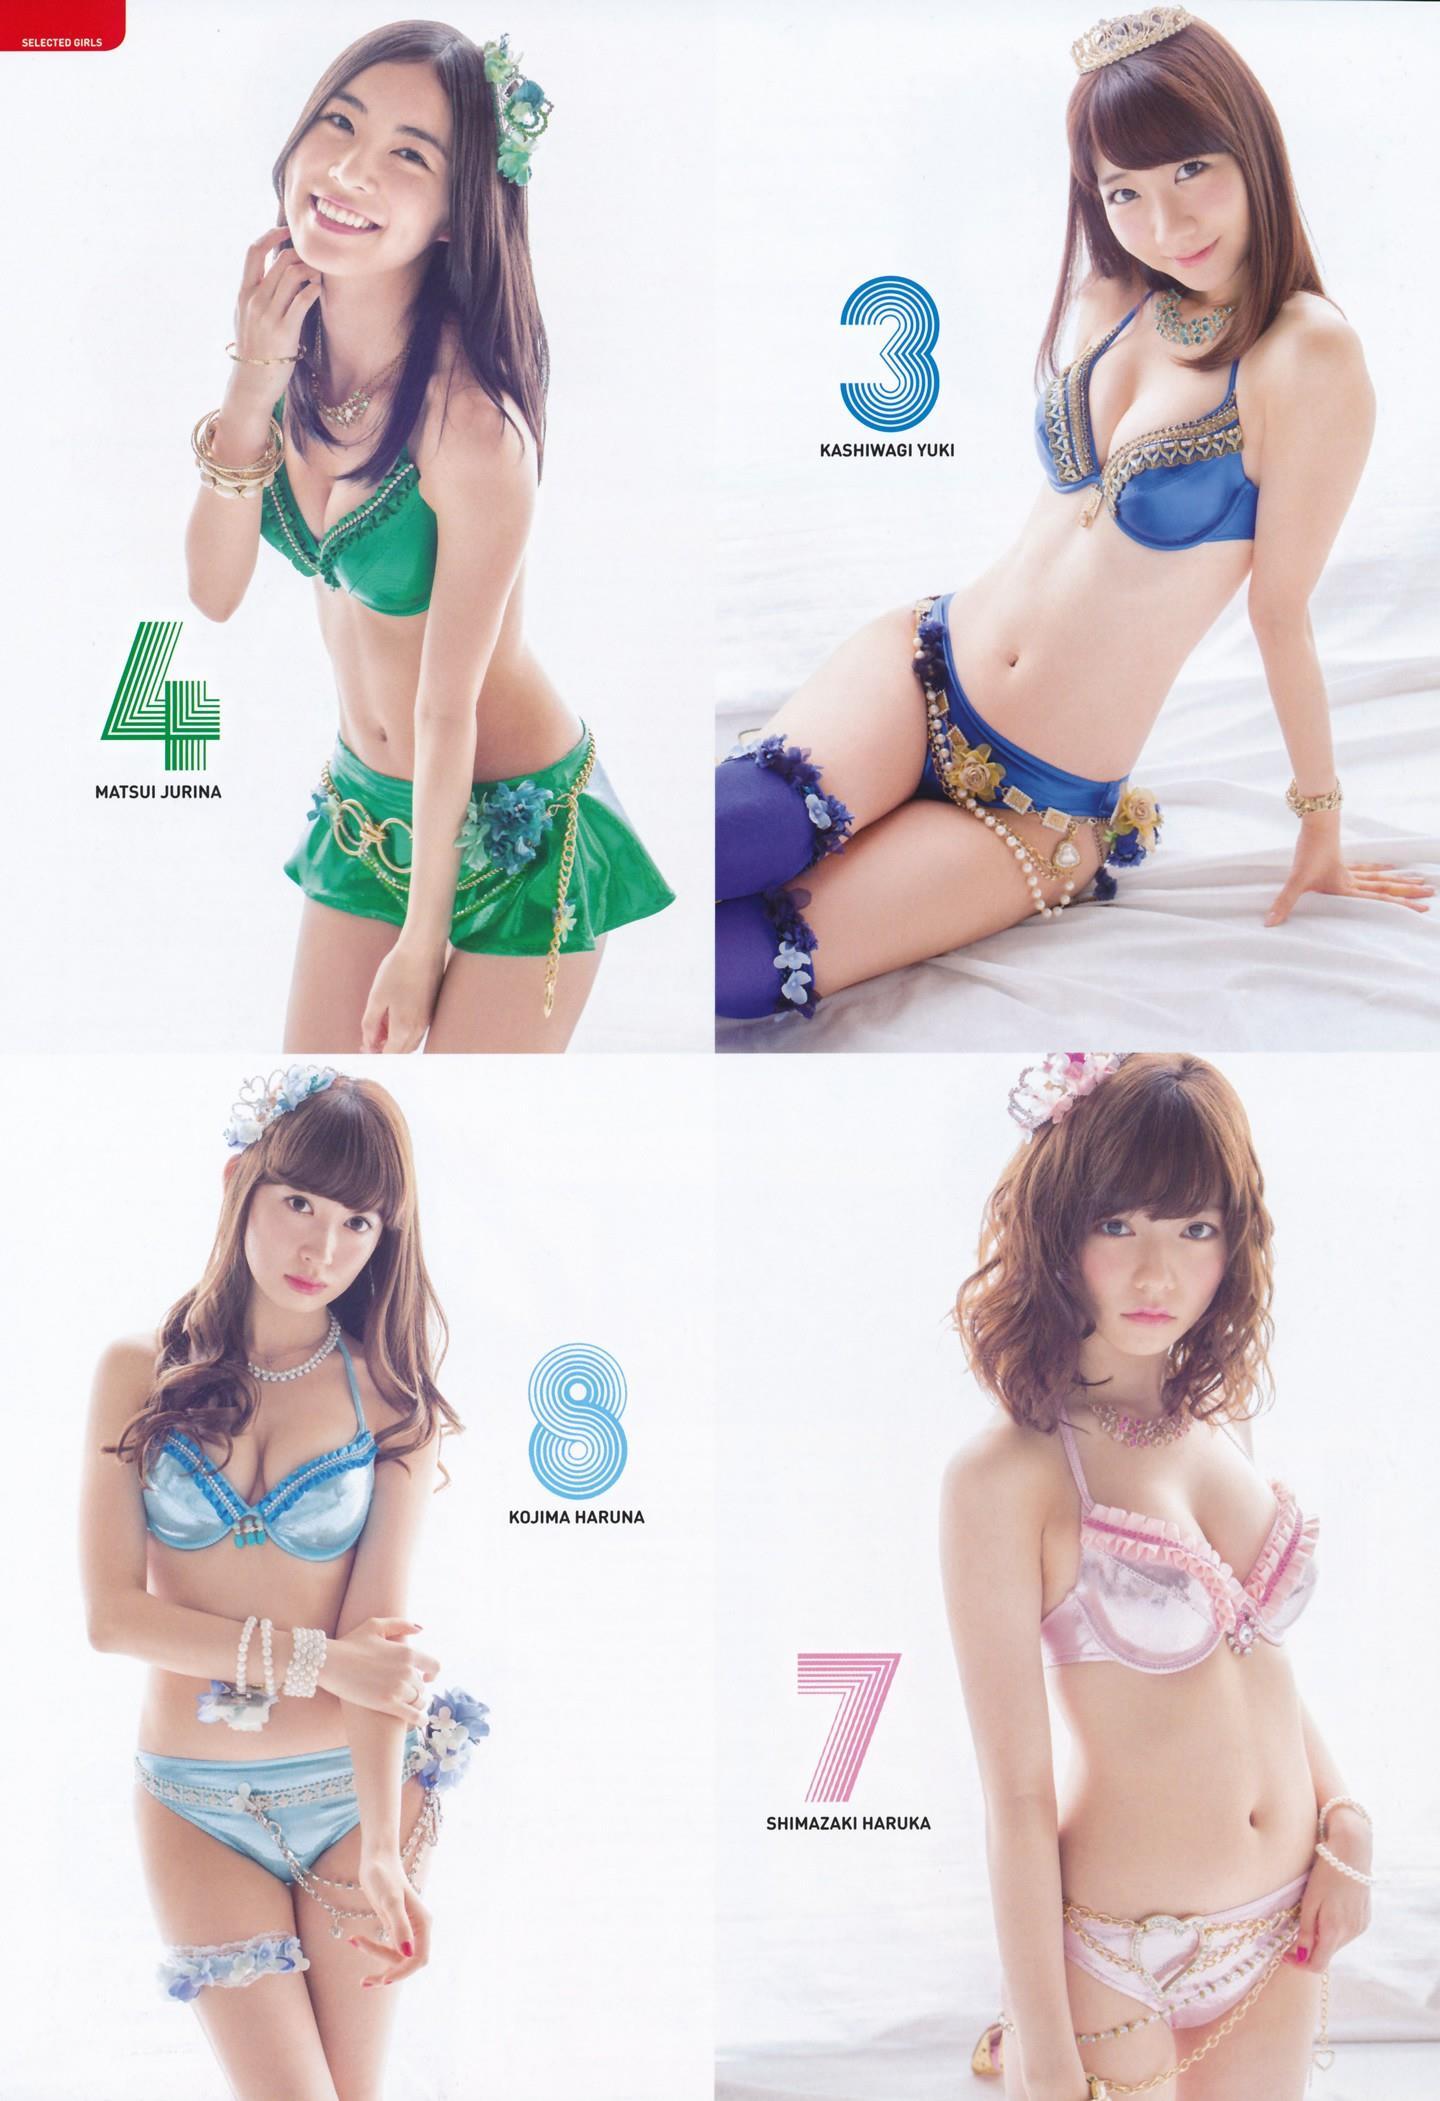 AKB48人気メンバー 画像 5